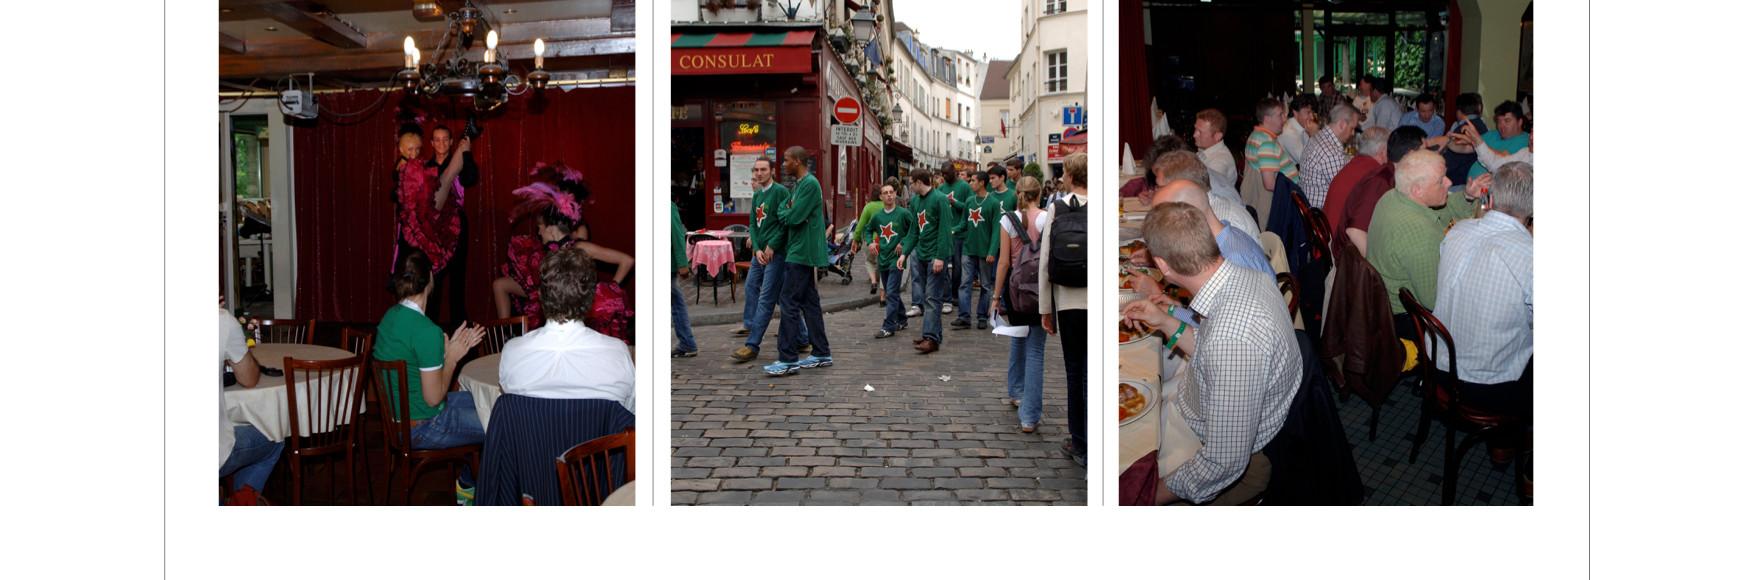 "Our Guests ""conquer"" Montmartre"